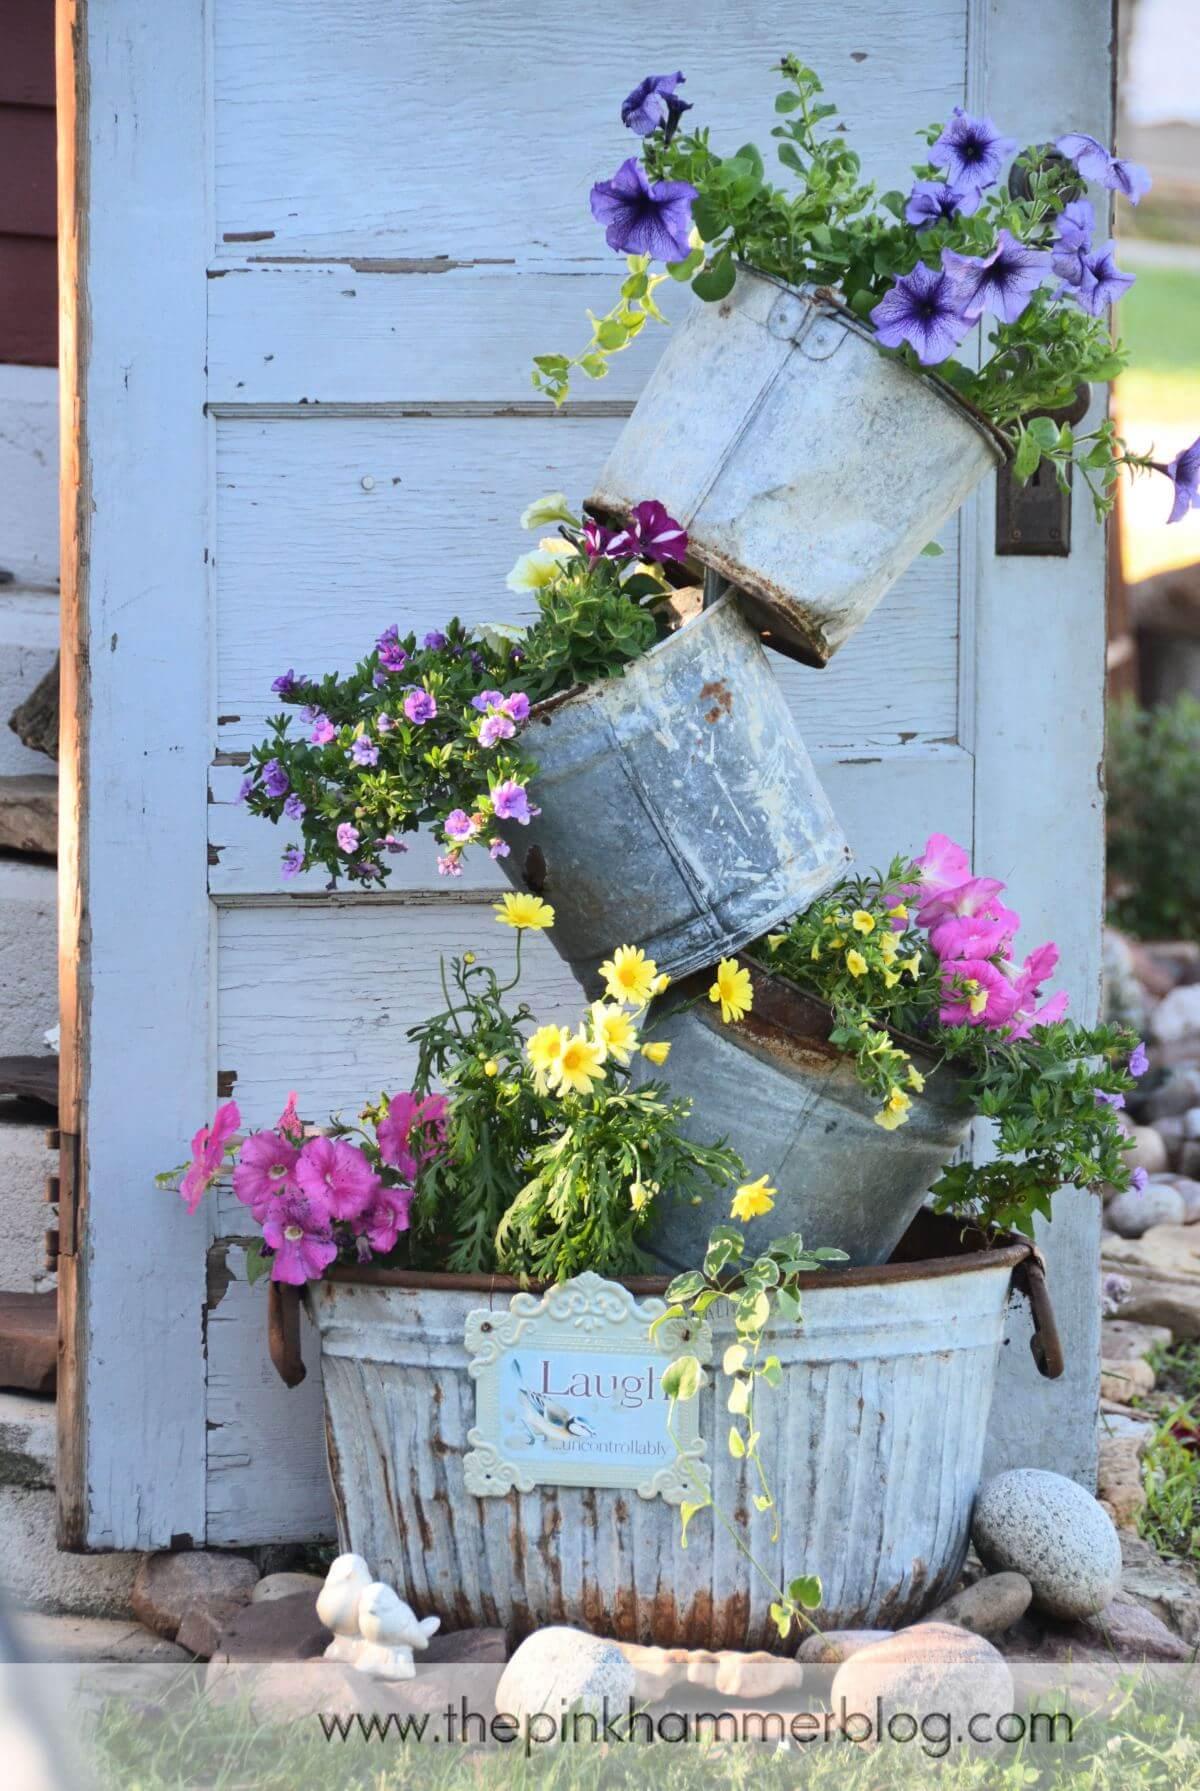 Una torre di fiori in giardino 20 idee creative a cui - Grossi fiori da giardino ...